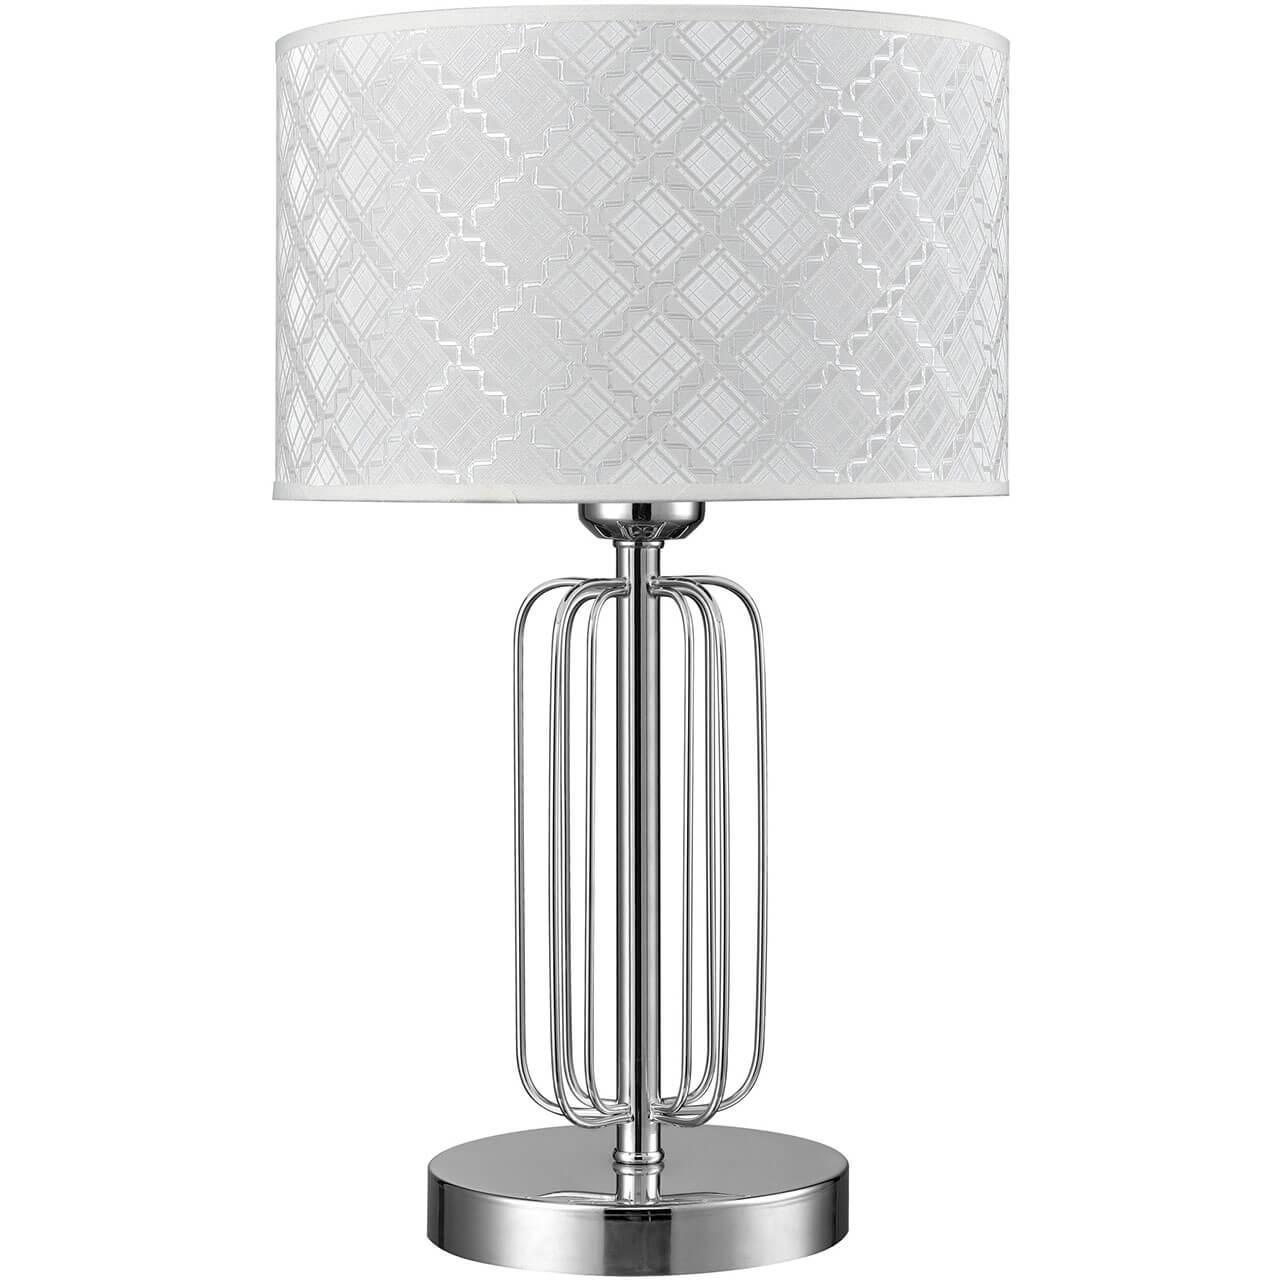 Настольная лампа Vele Luce Fillippo VL1983N01 настольная лампа декоративная vele luce toppi vl1841n01